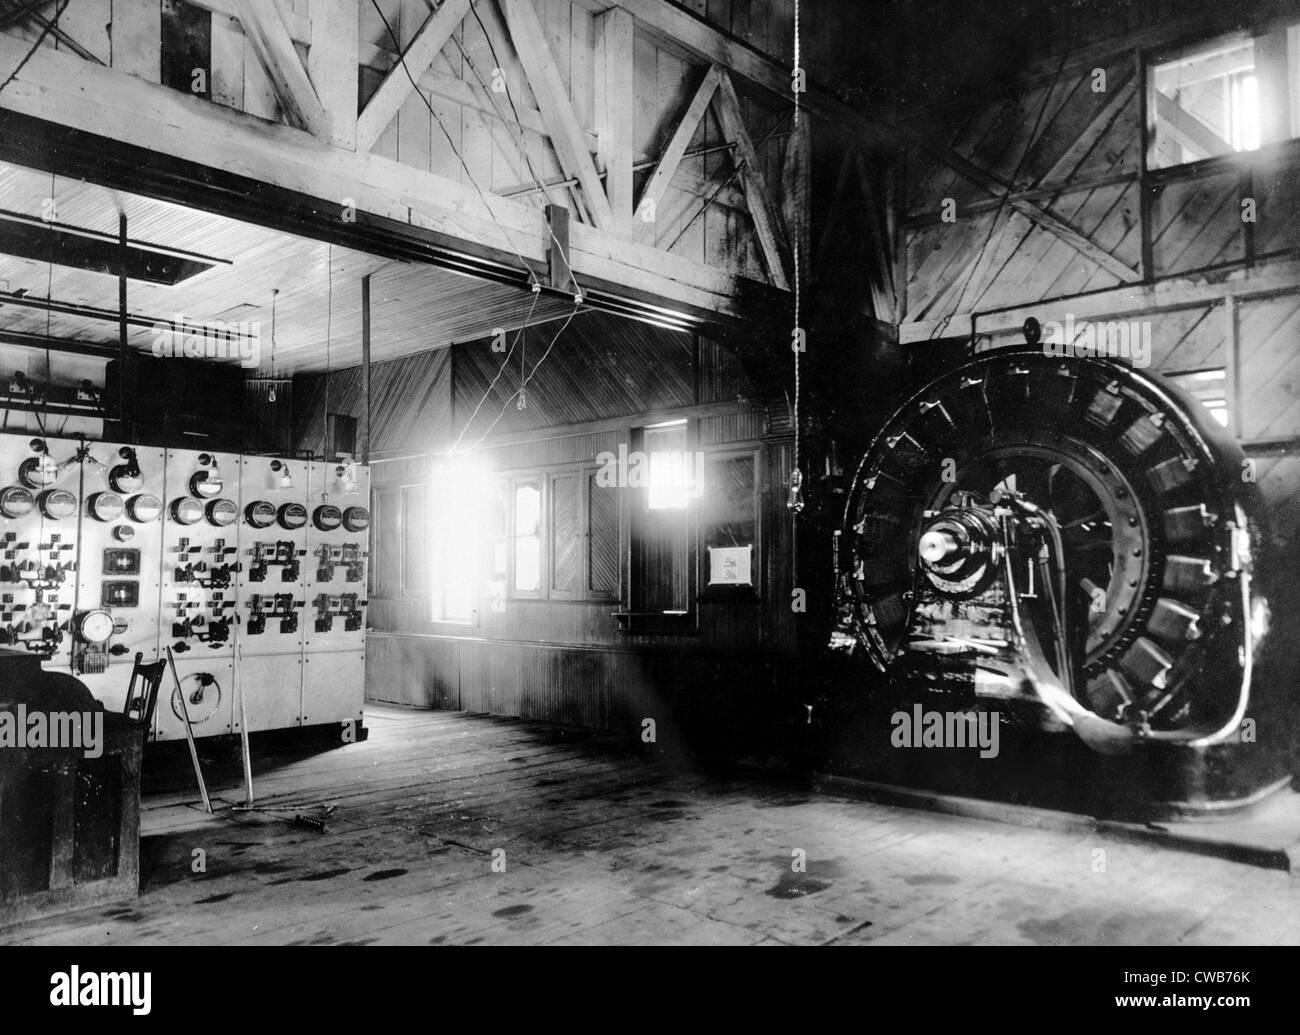 Tesla Black And White Stock Photos Images Alamy Nikola Alternating Current Diagram The Ac Blinking Causes Westinghouse Generator Worlds First Single Phase Power Transmission System